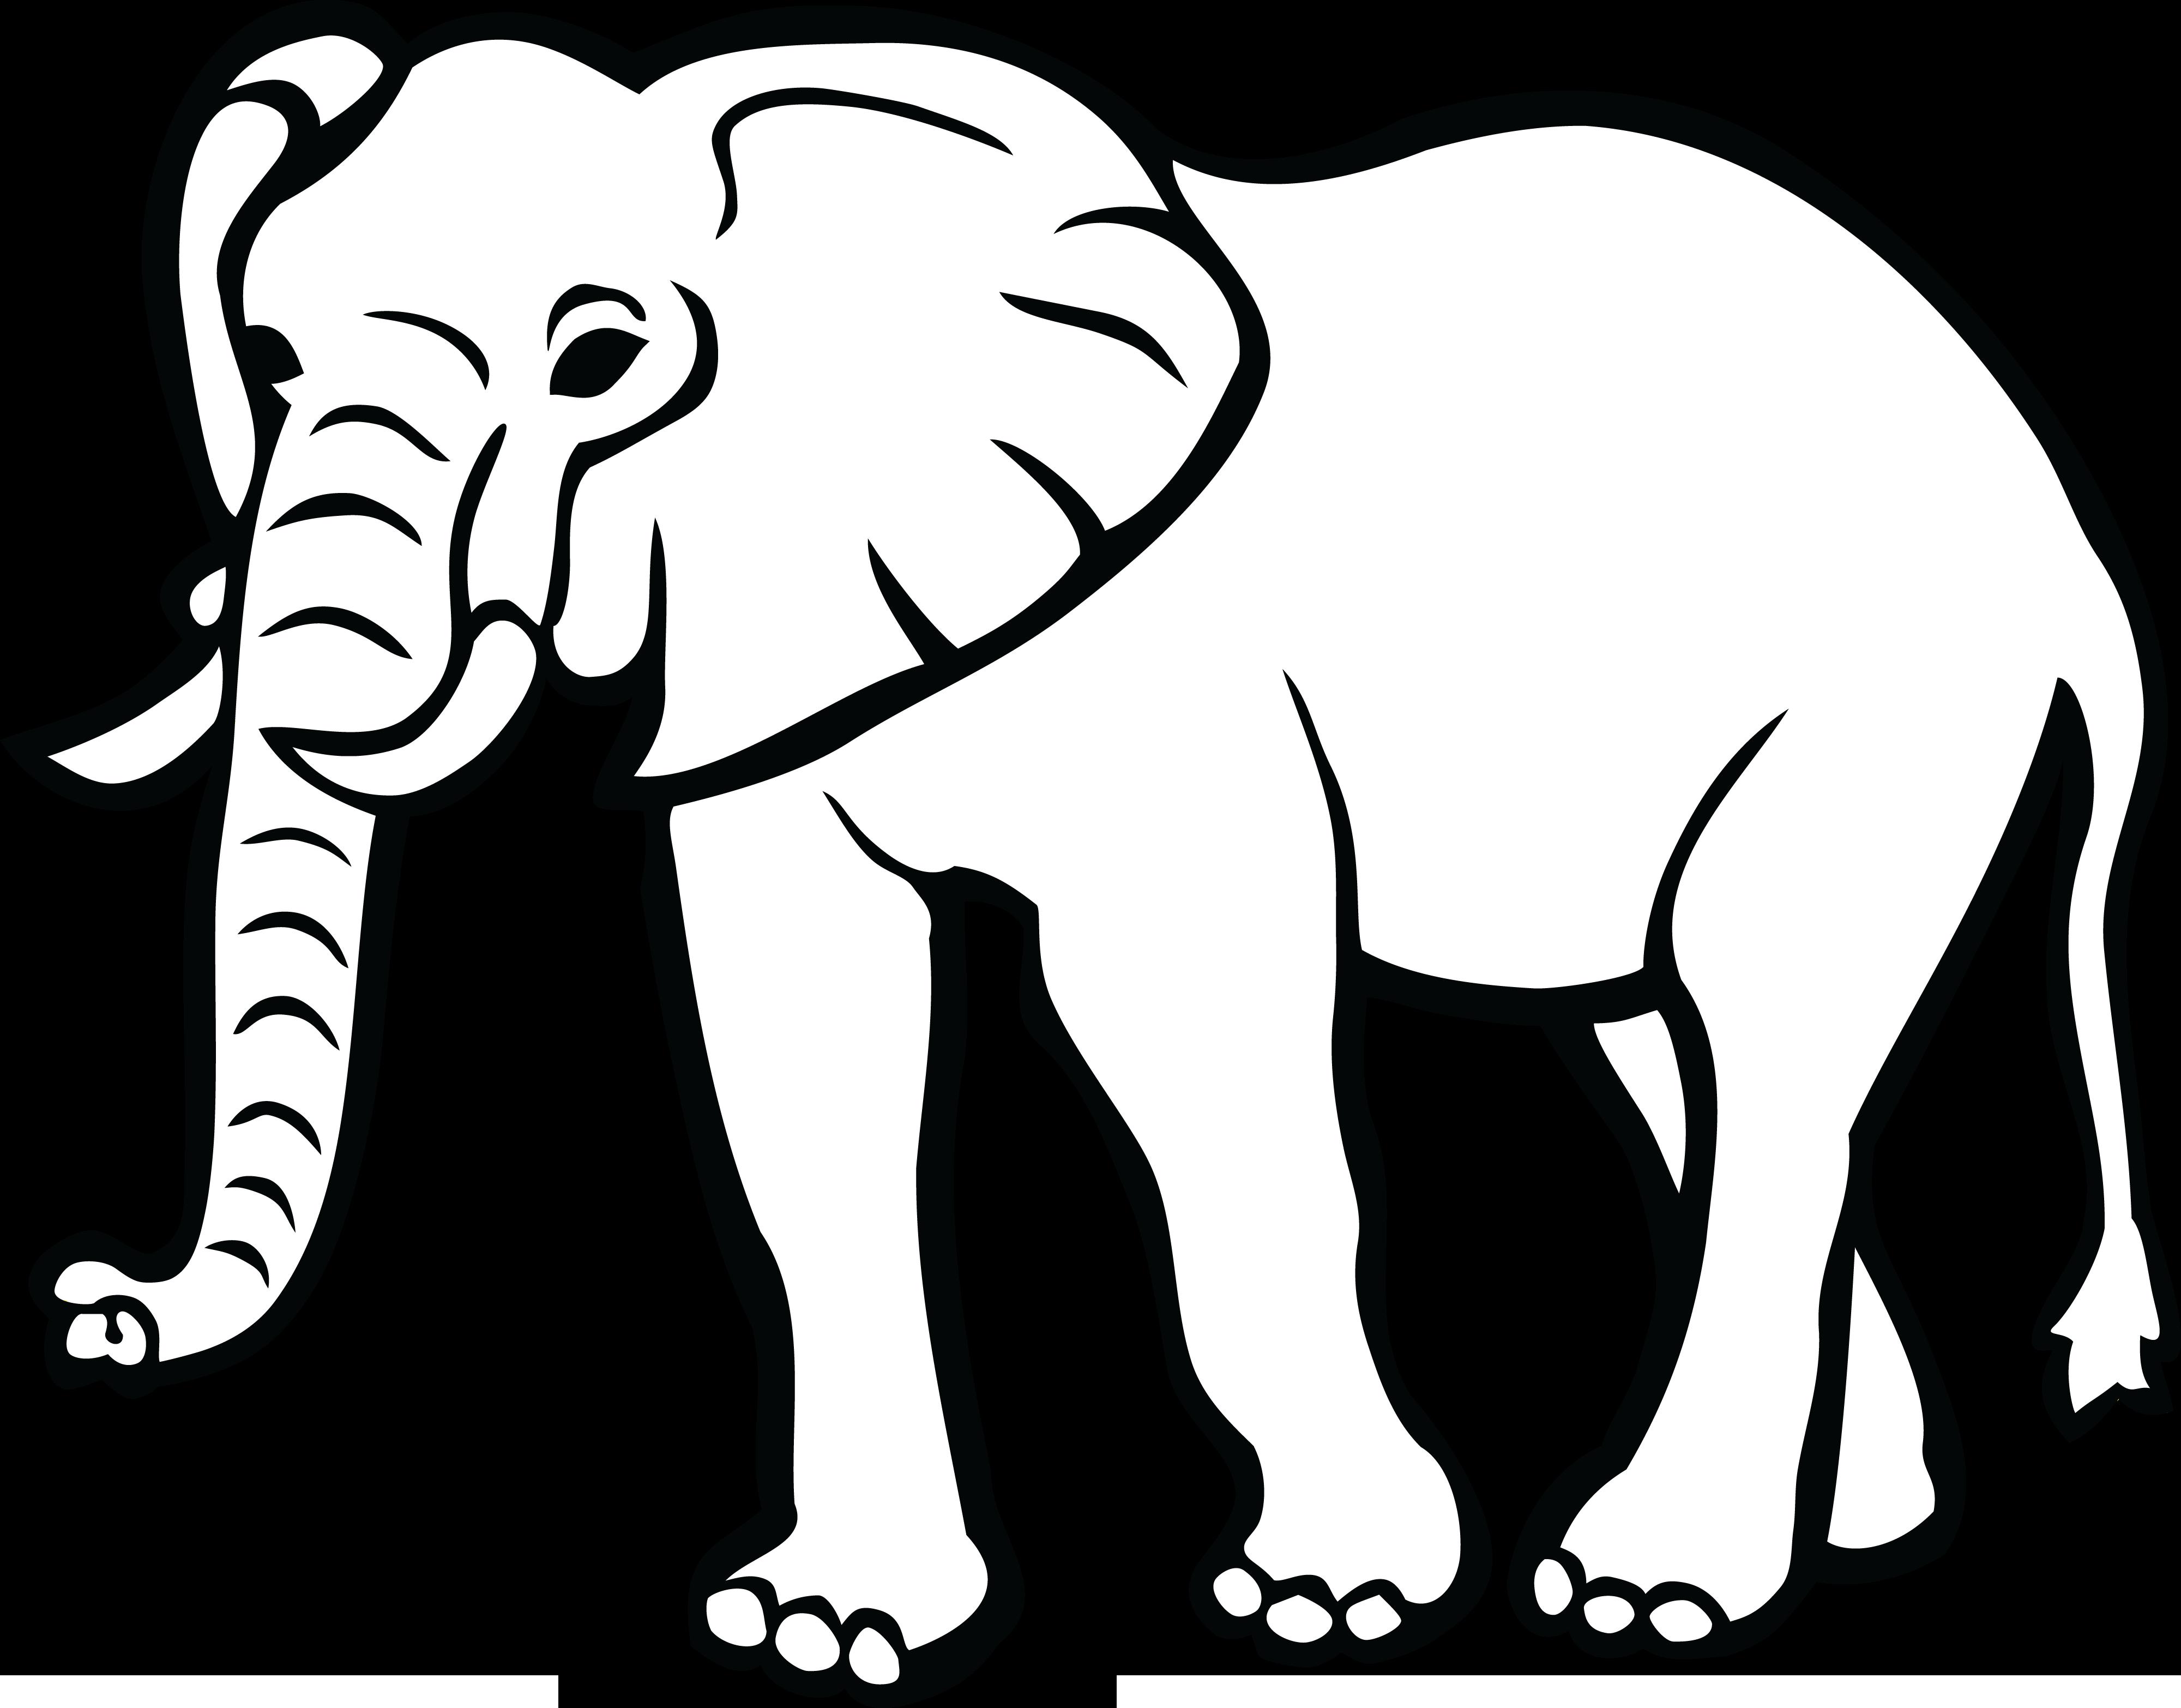 Png Black And White Elephant Elefanten Umriss Elefant Zeichnung Elefanten Silhouette